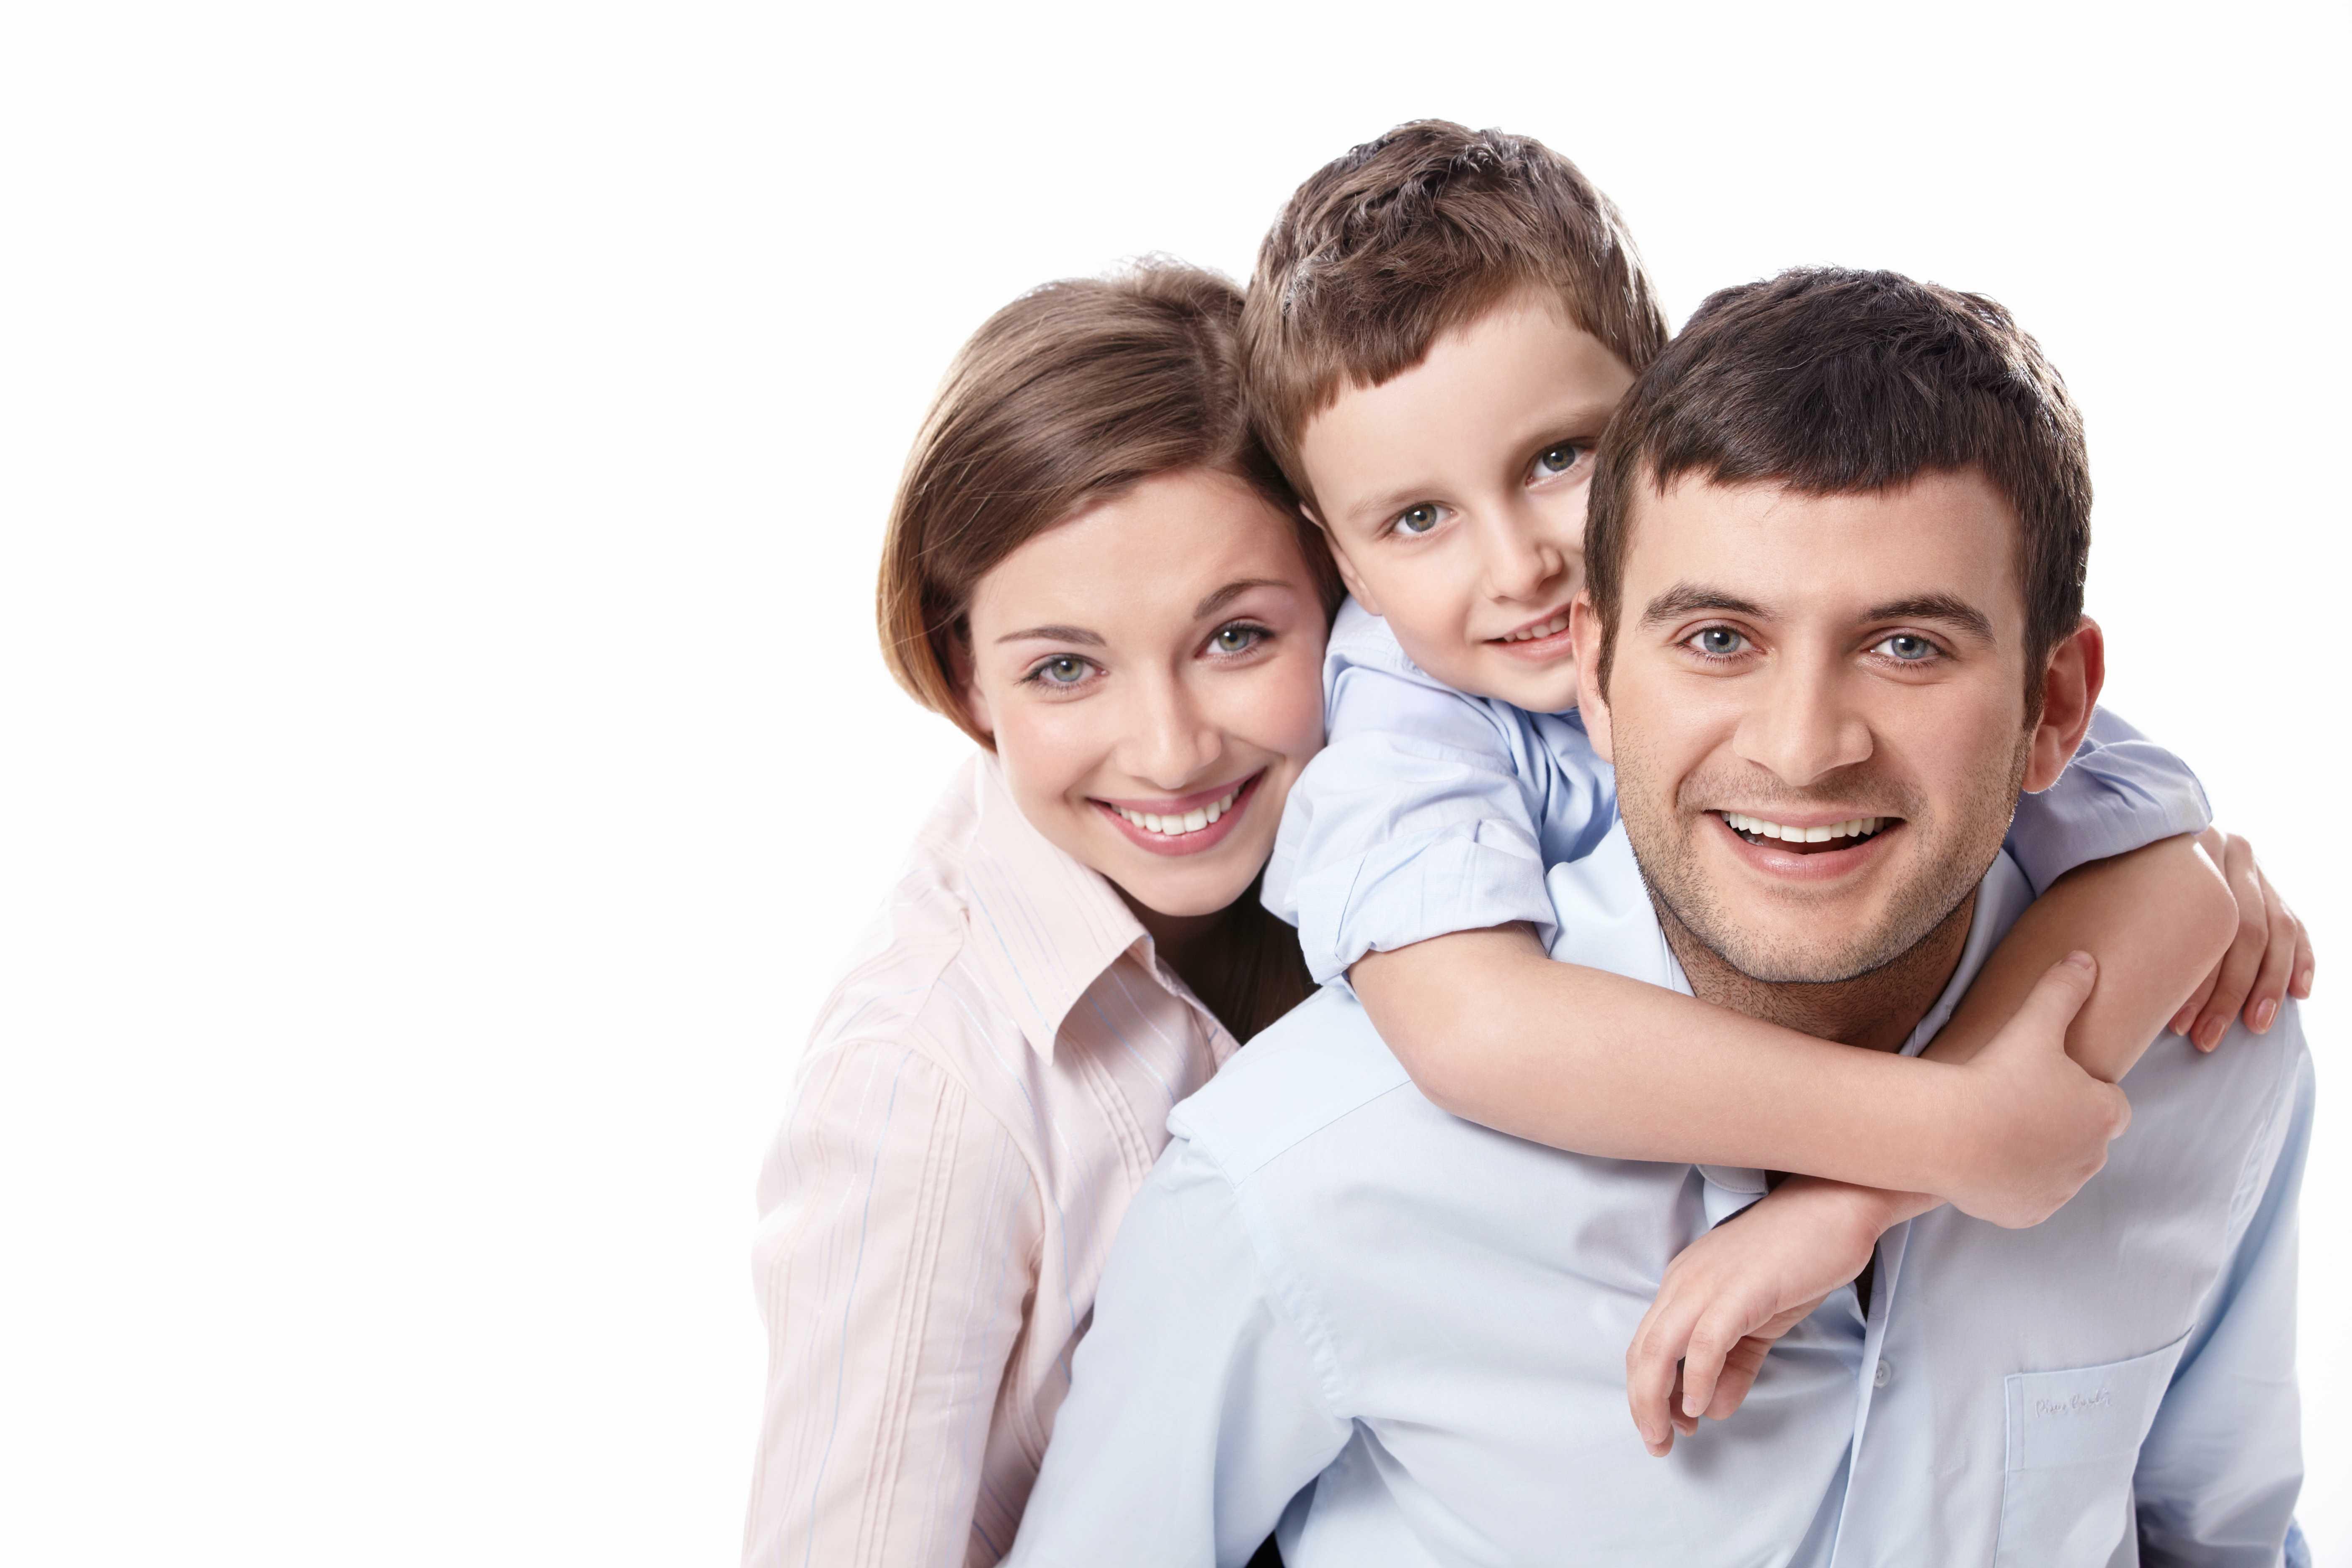 Elternberatung gemäß § 95 Abs.1a AußStrG